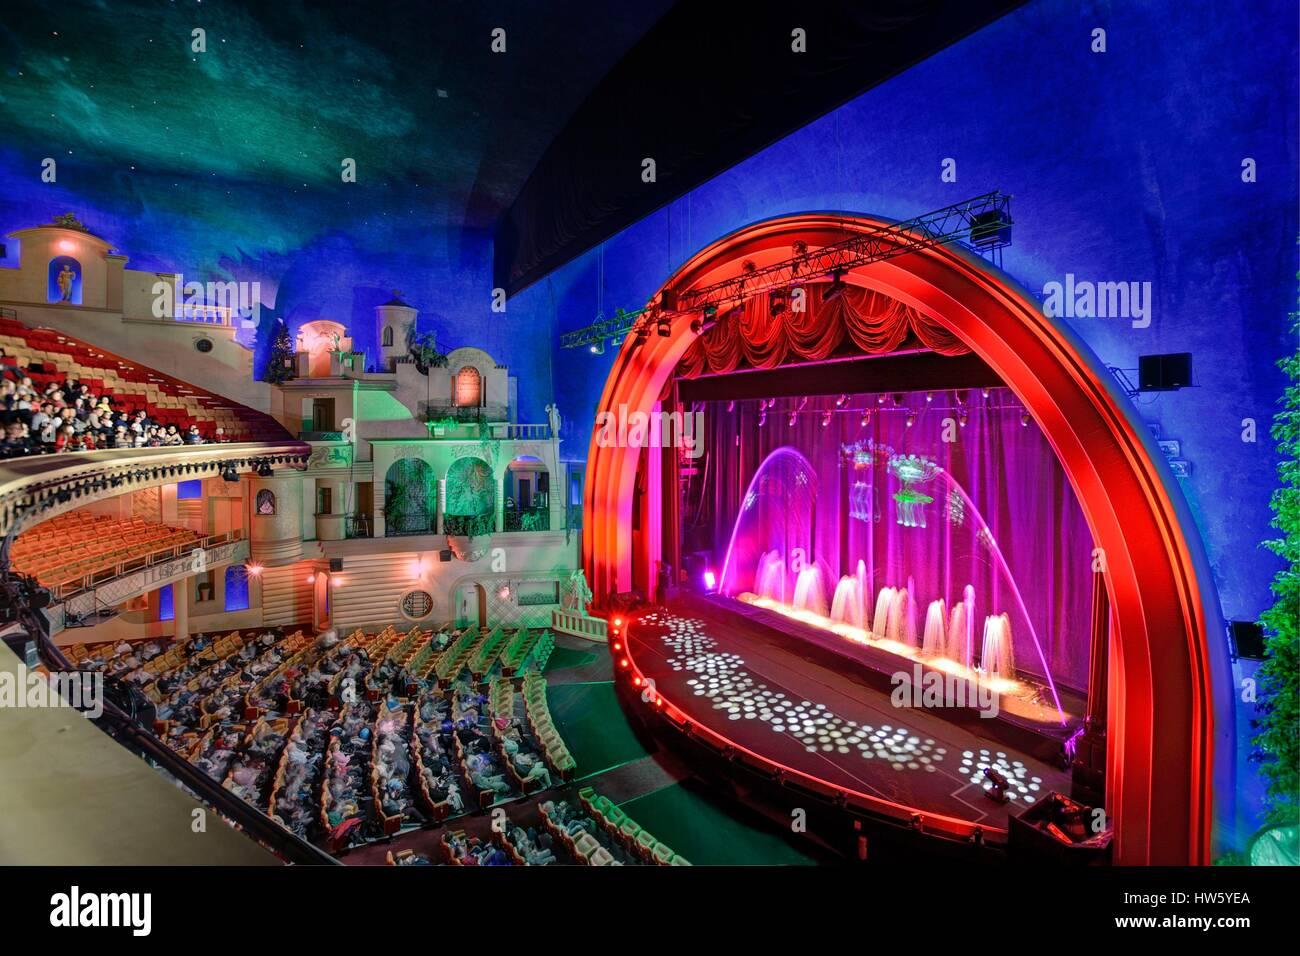 France, Paris, Grand Rex cinema, the aquatic show Stock Photo - Alamy